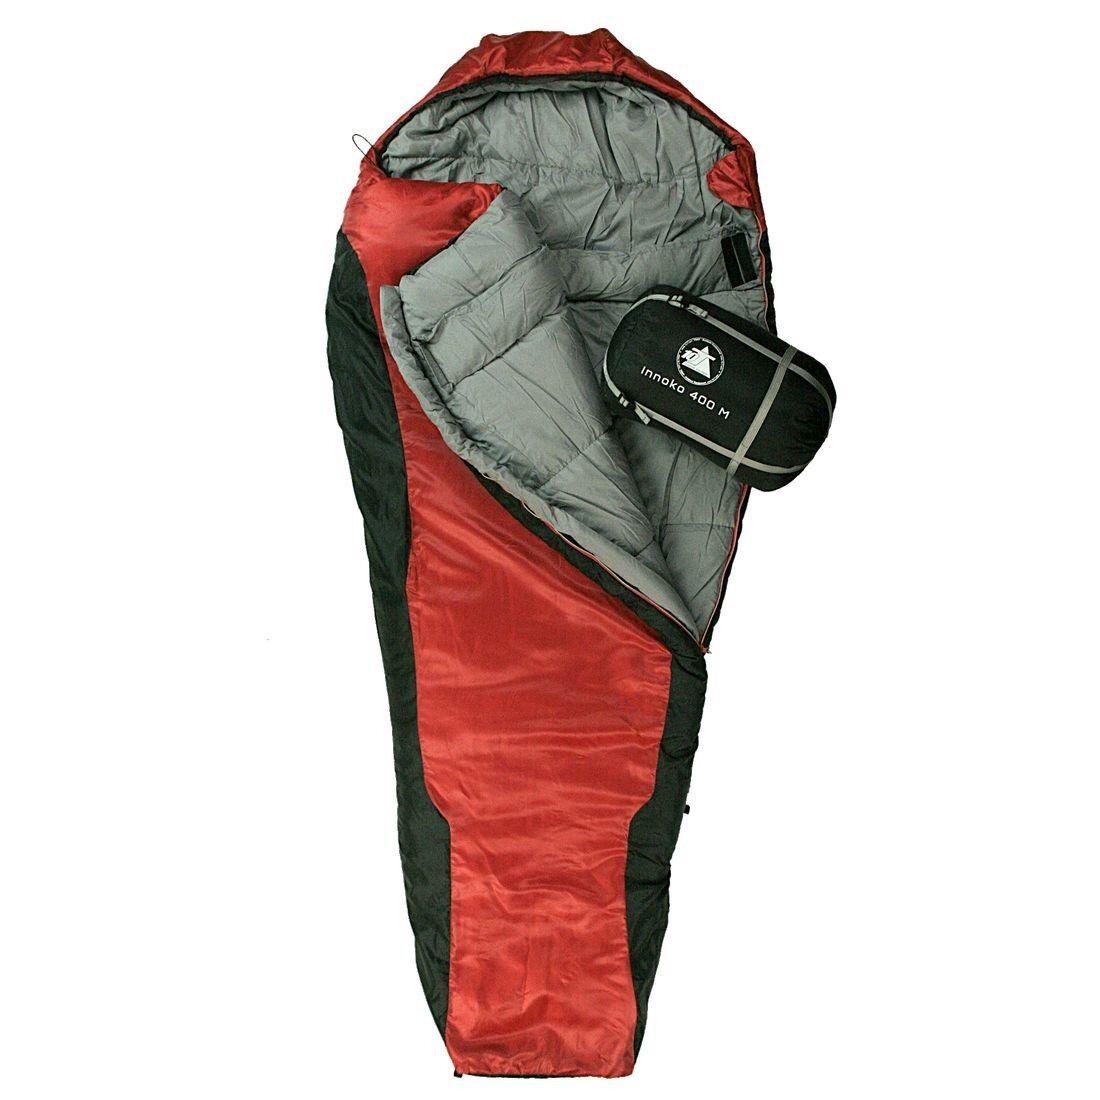 10T Innoko 400M - Sacco a pelo a mummia singolo invernale 200x85/55 cm, nero/ros